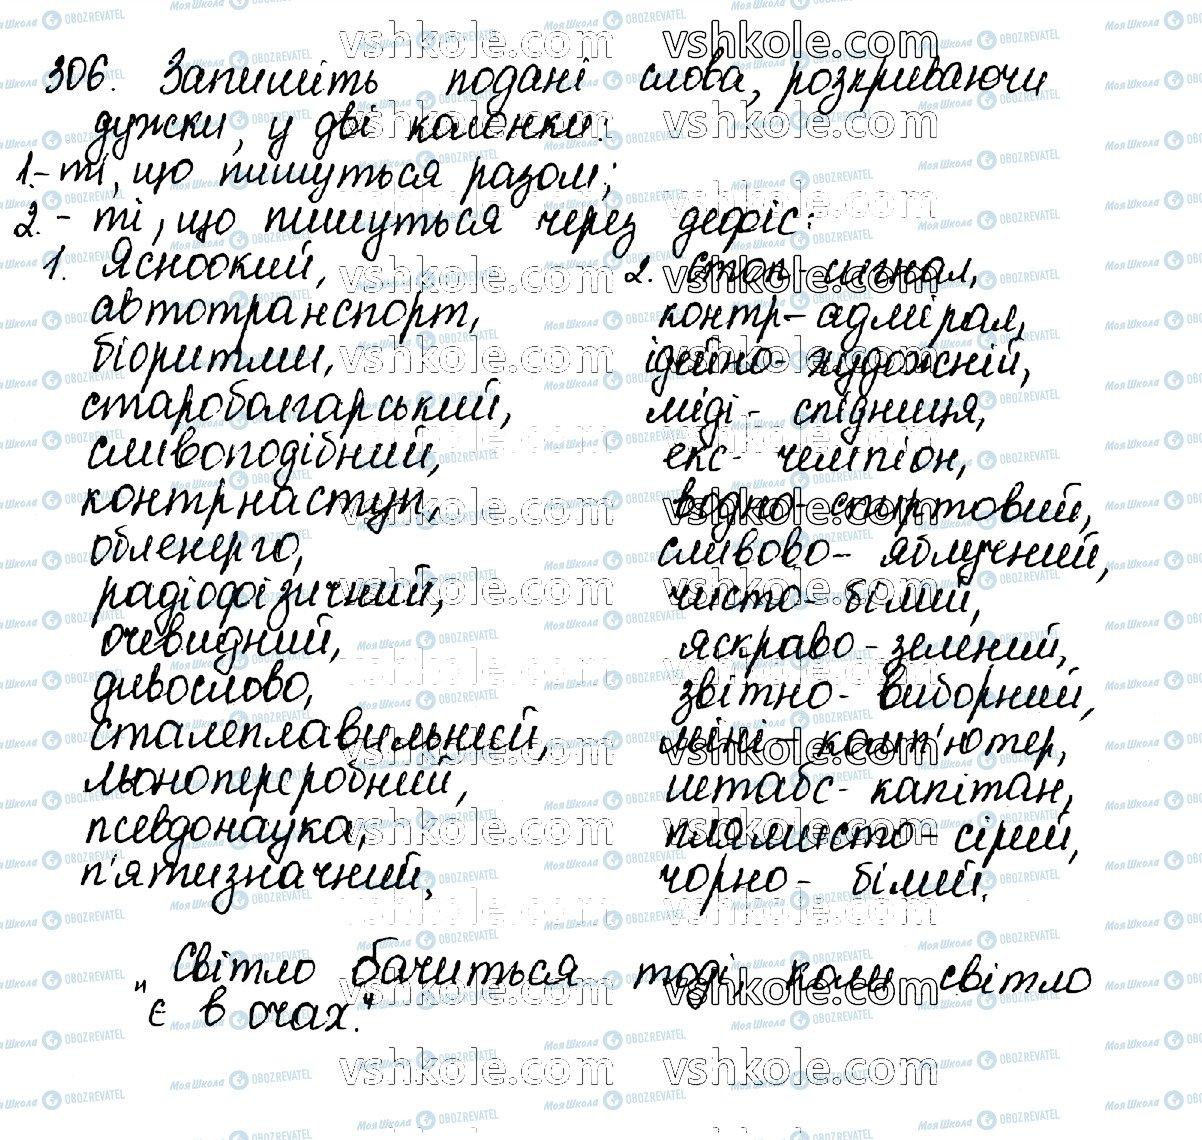 ГДЗ Укр мова 10 класс страница 306